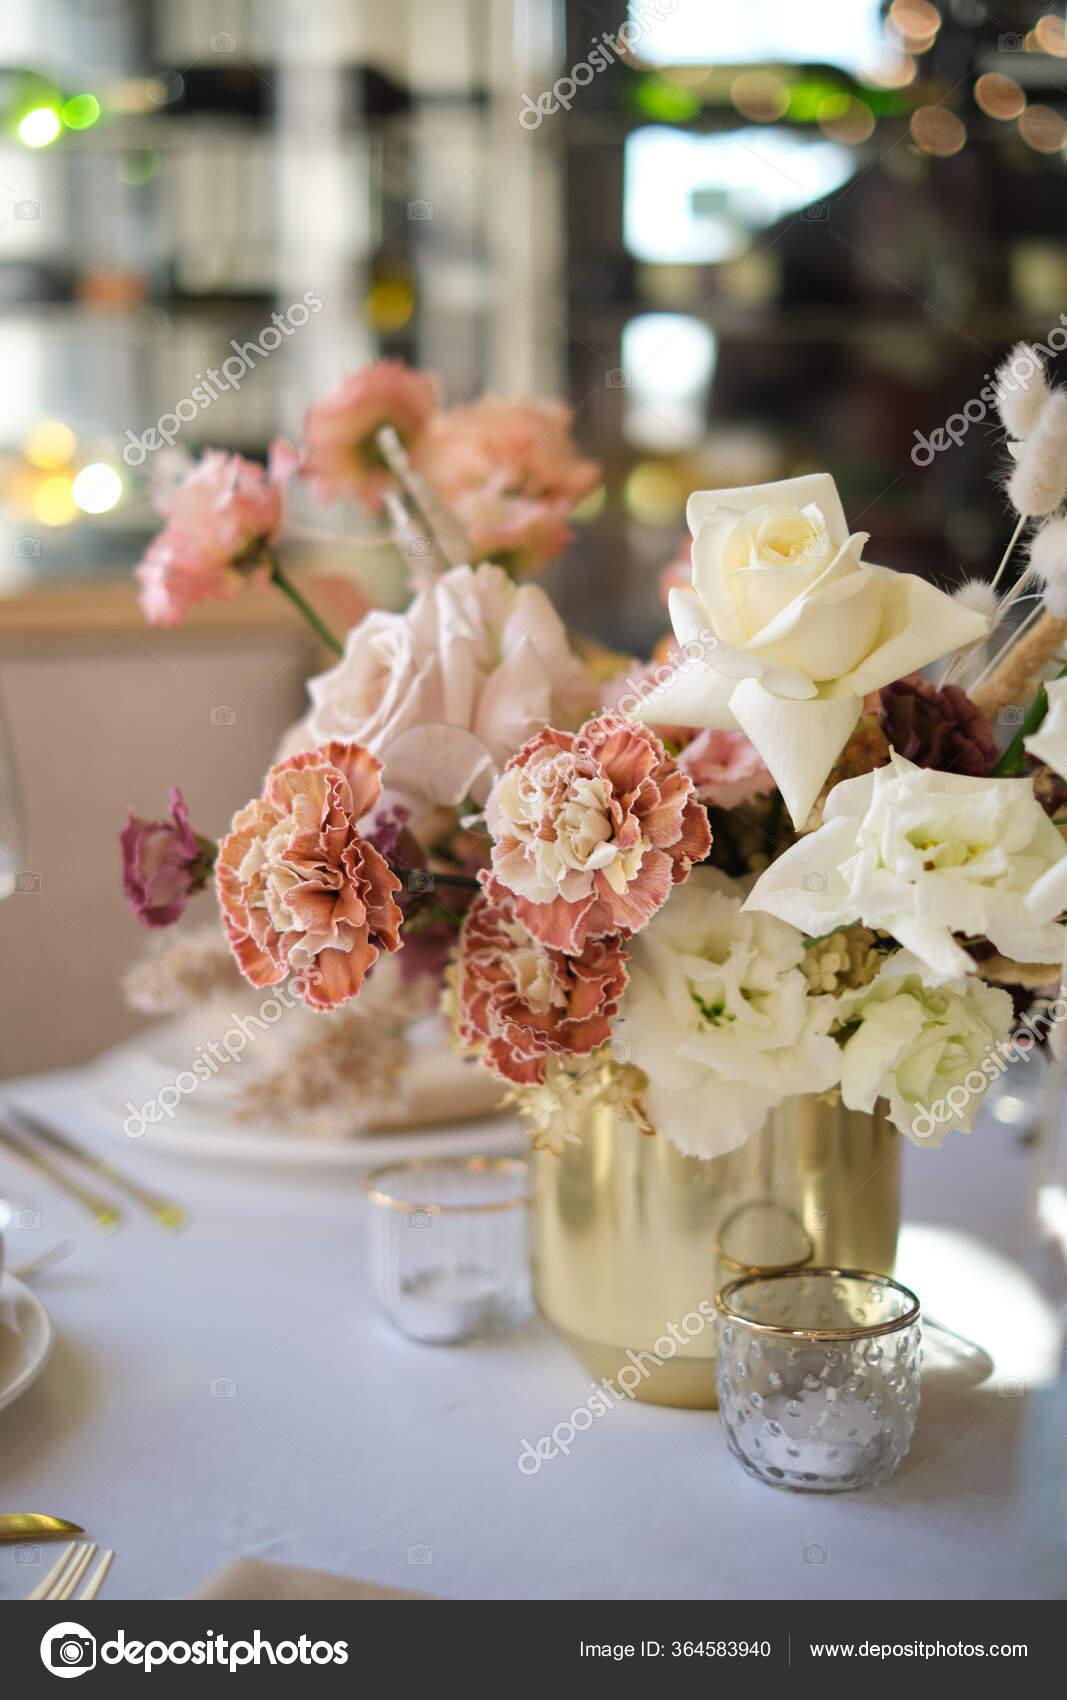 Luxury Cozy Autumn Wedding Table Decoration Restaurant Fresh Dried Flowers Stock Photo Image By C Pavelborn 364583940